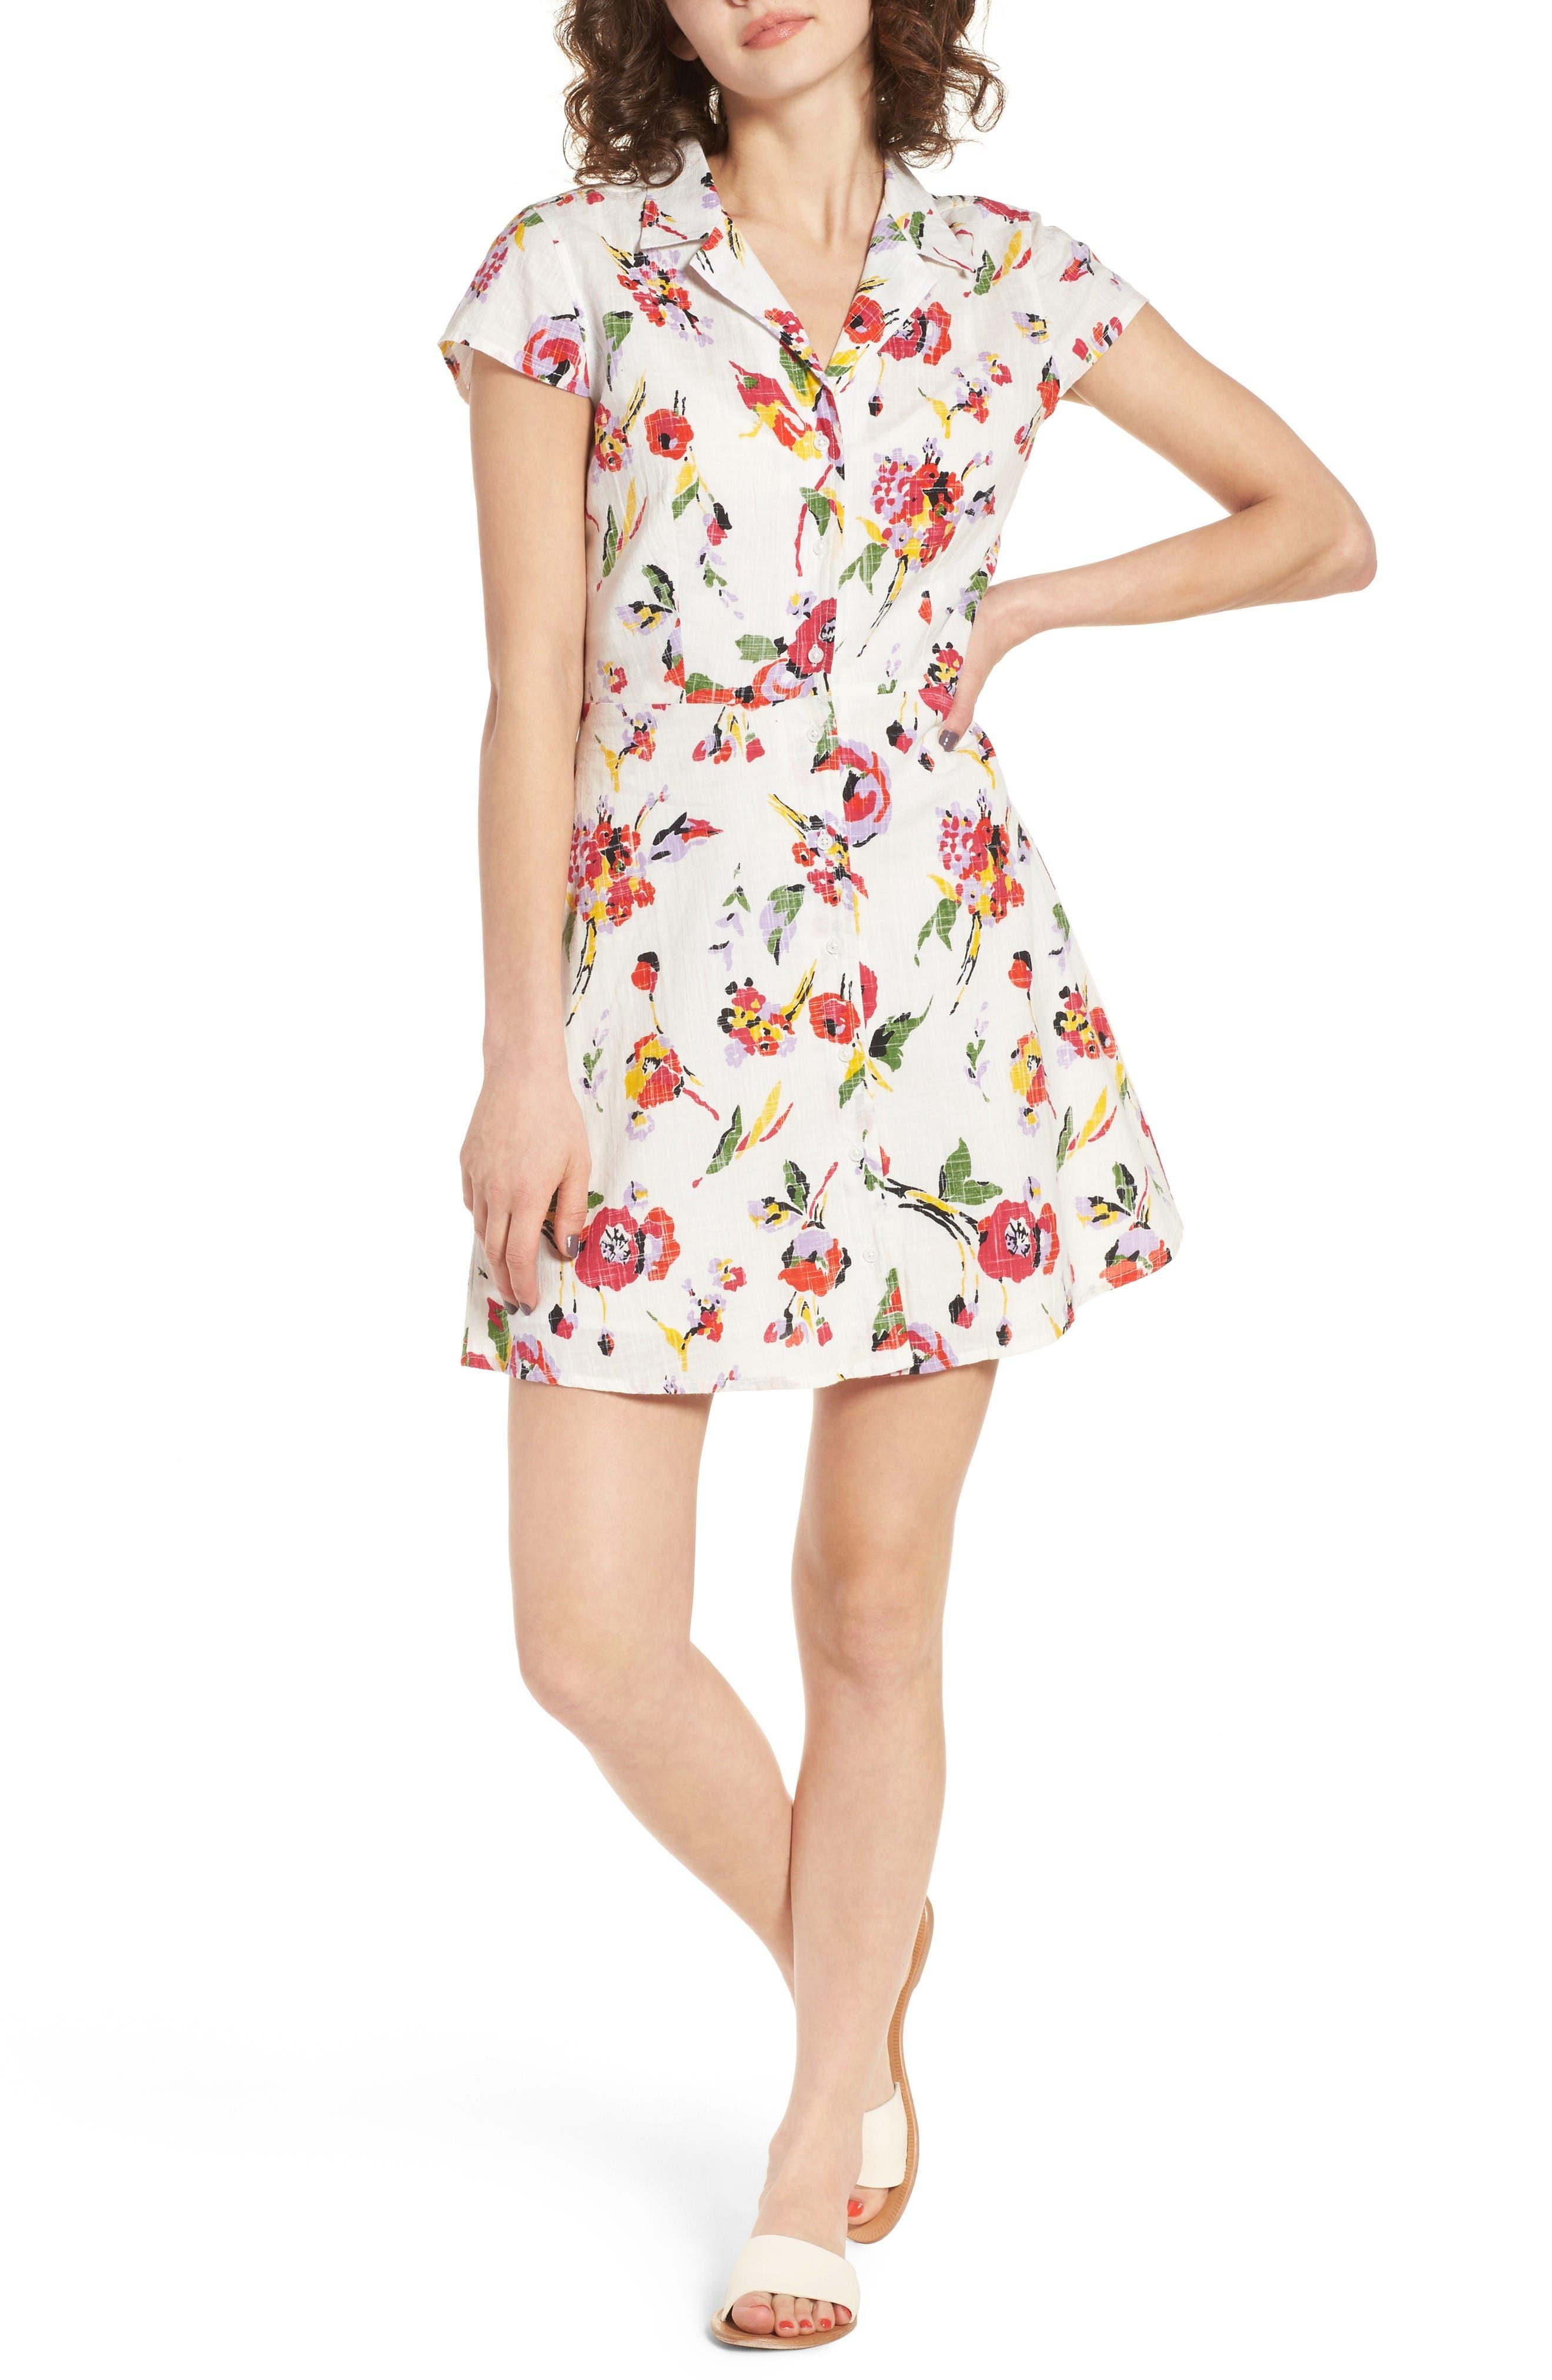 Alternate Image 1 Selected - Obey Desi Floral Print Cotton Dress